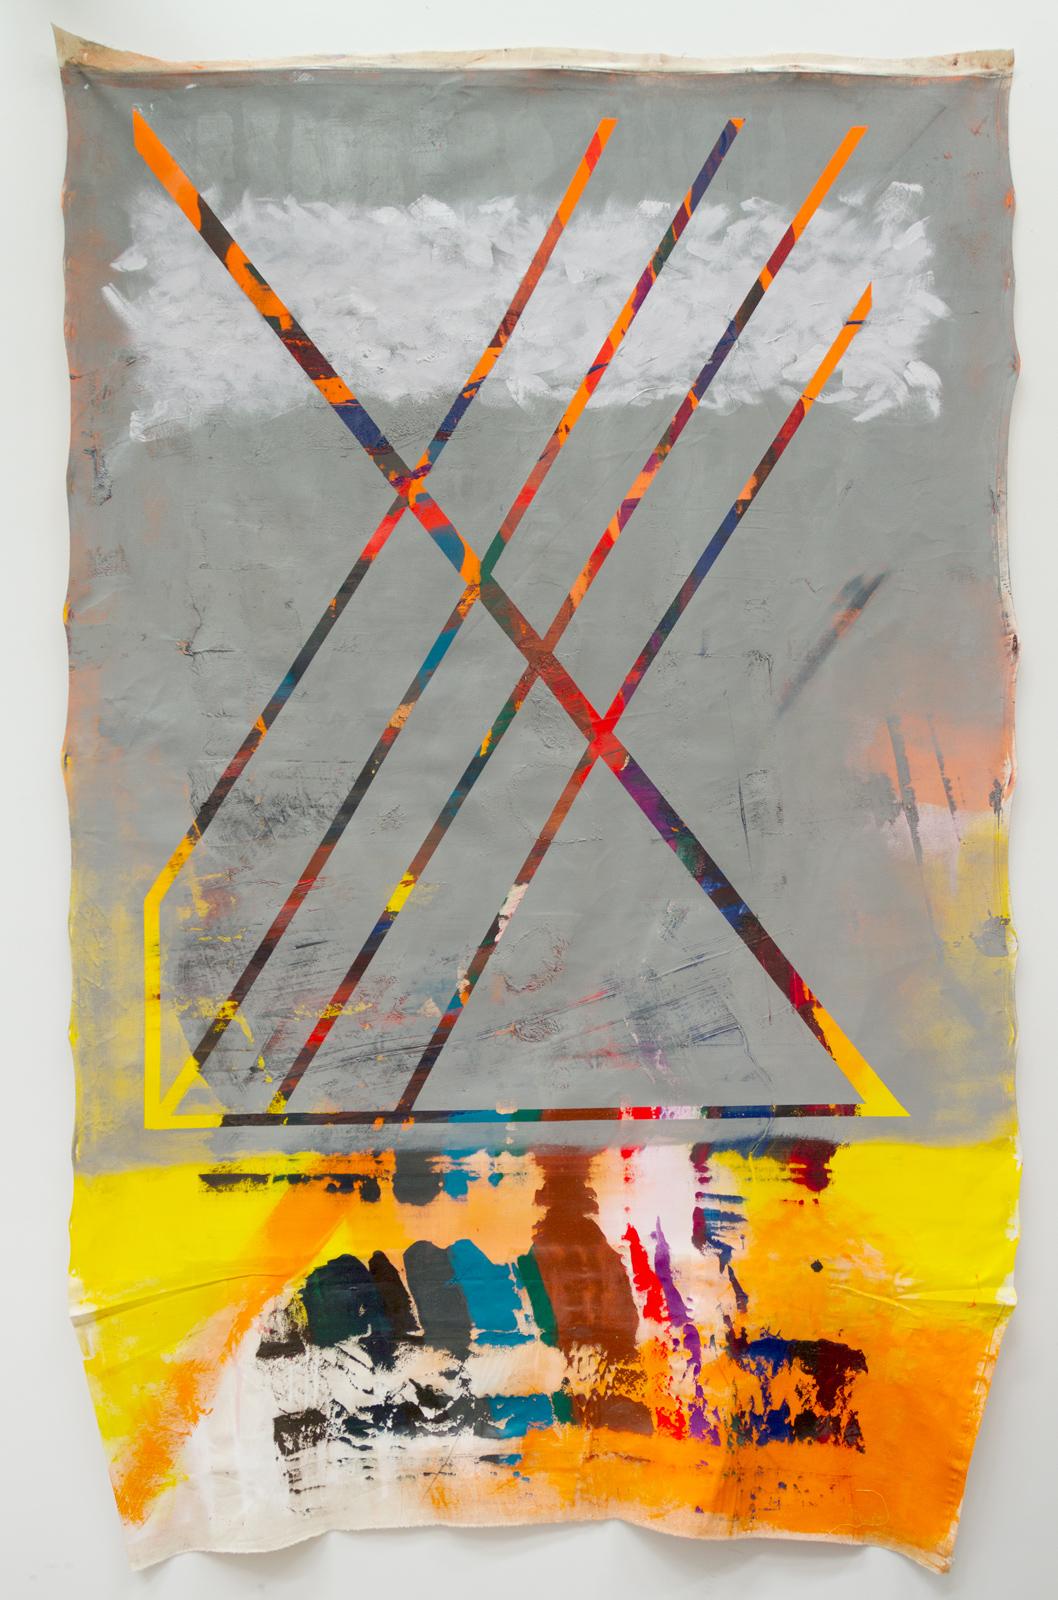 Grey Ex, oil on canvas, 100 x 72